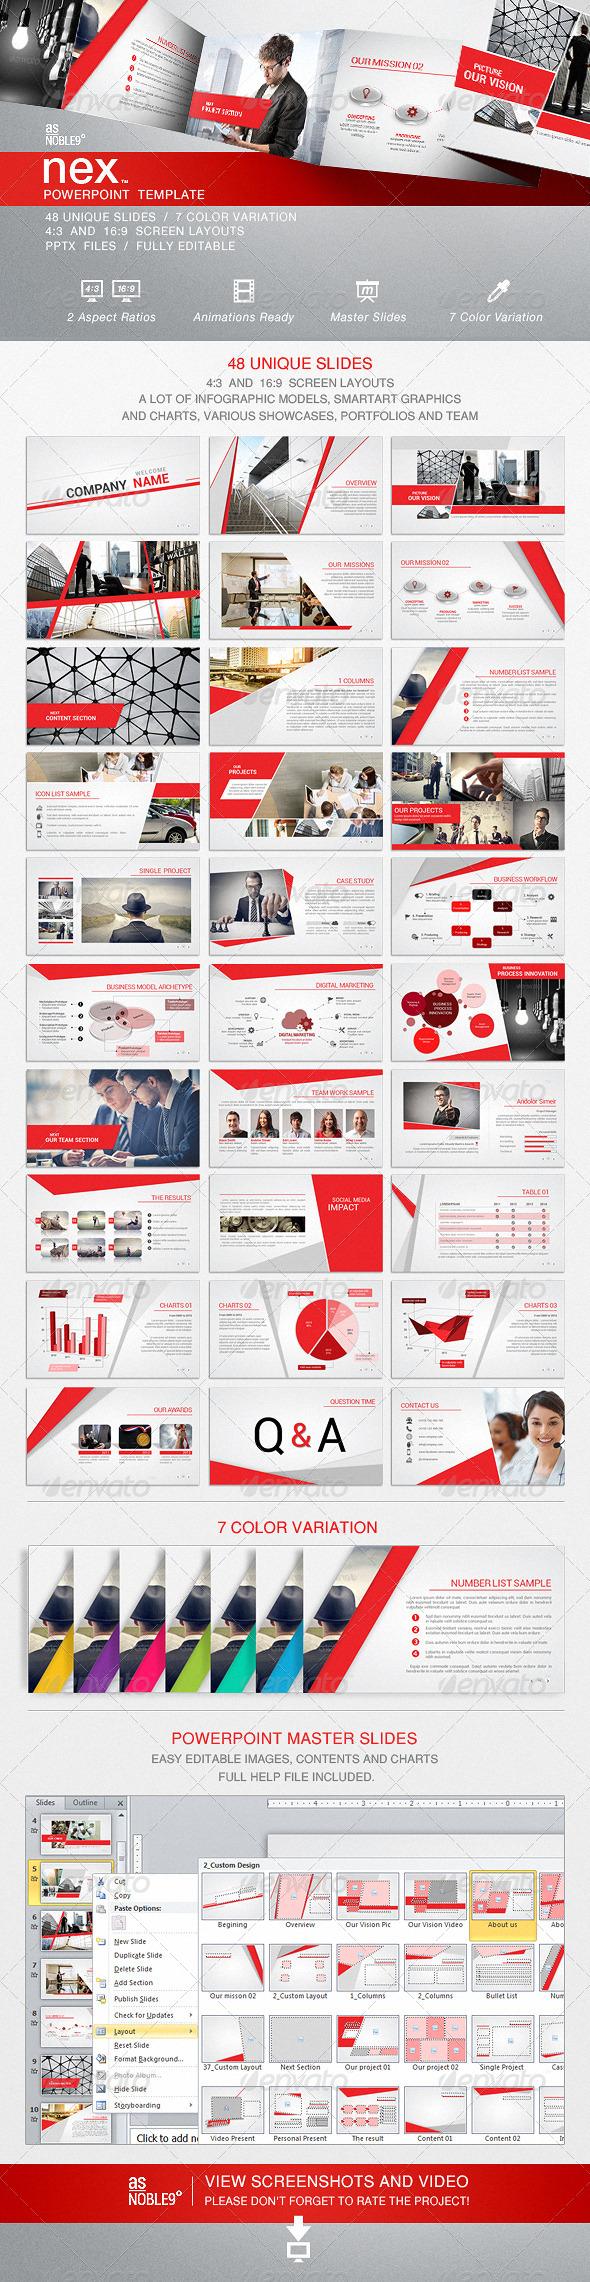 GraphicRiver NEX PowerPoint Template 6688274